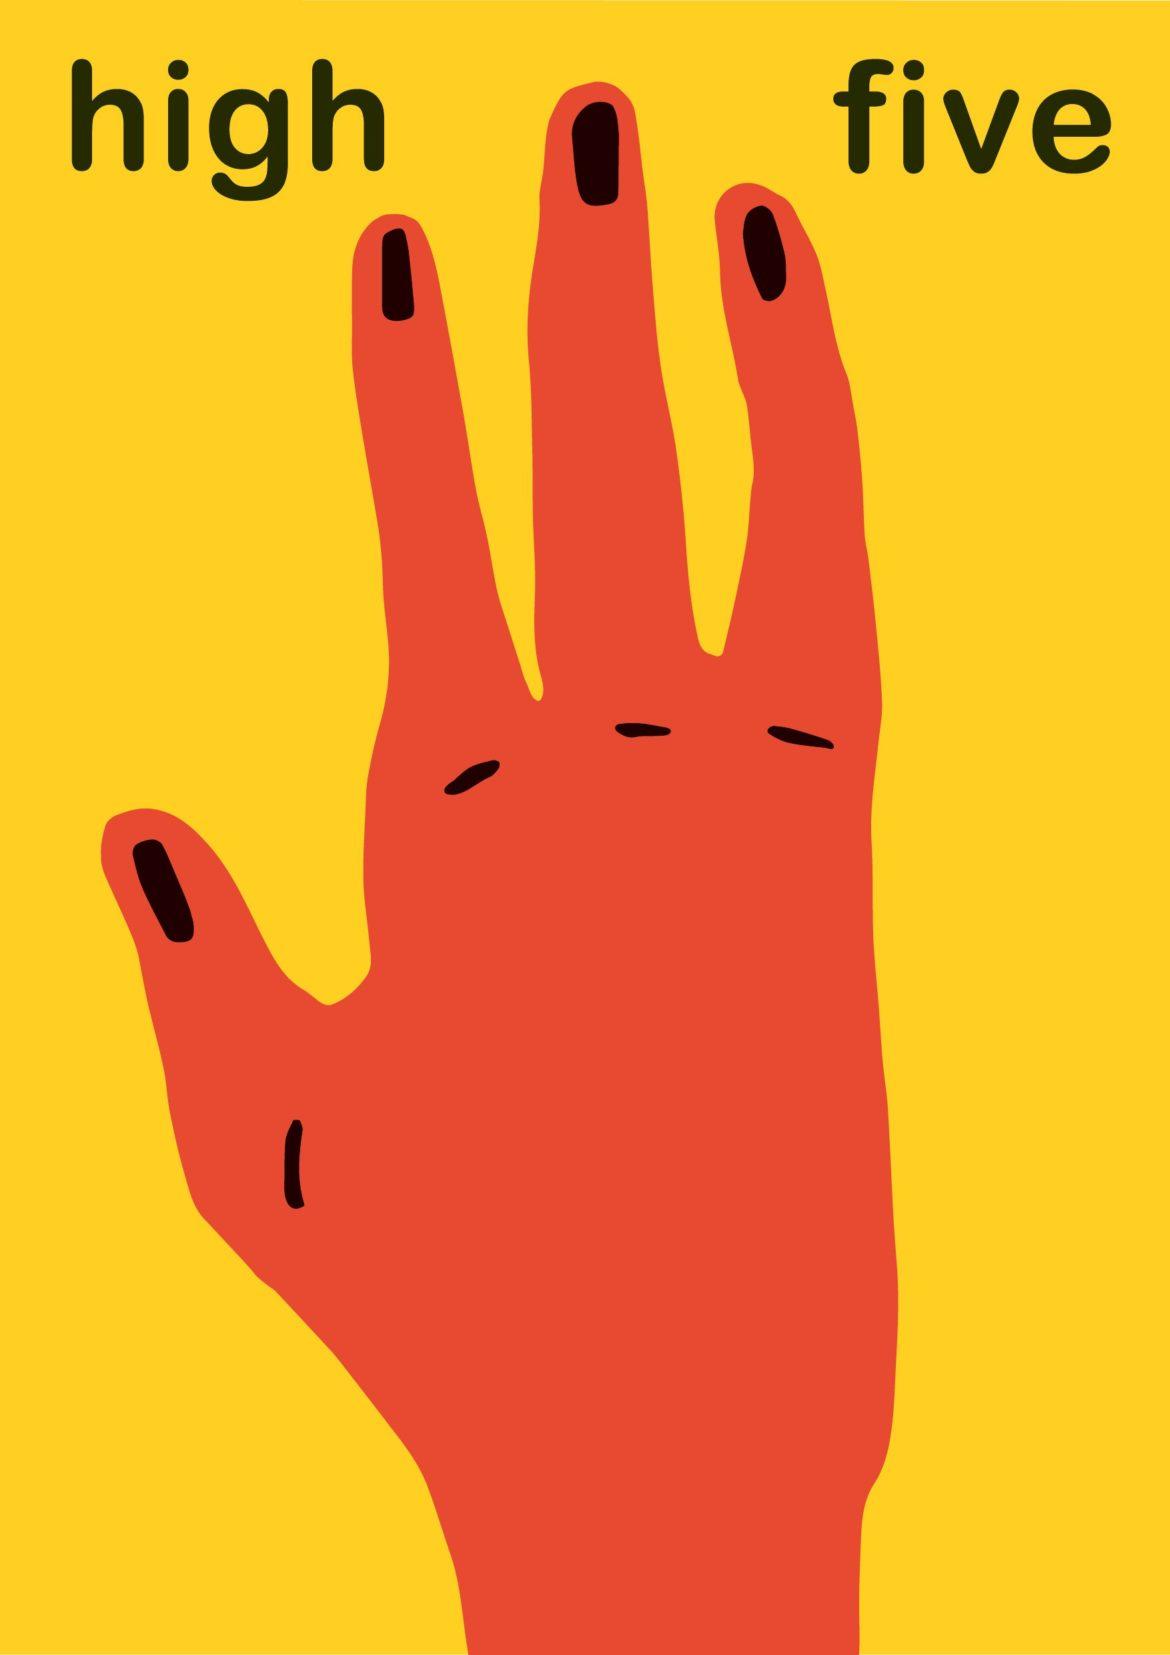 Poster Design |Illustration |Praktikum | Plakatwettbewerb